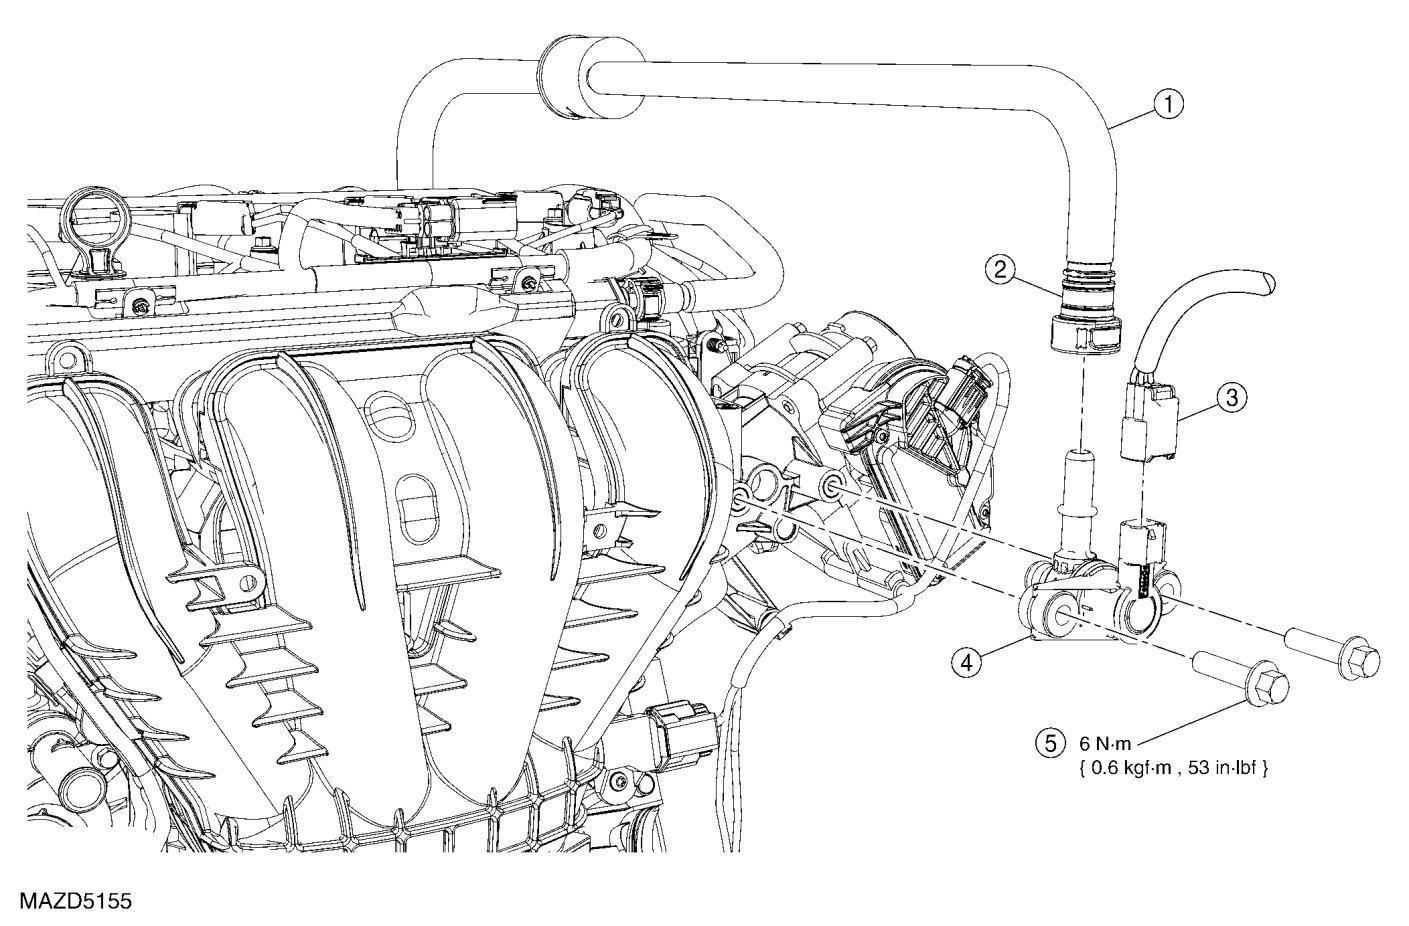 2010 Mazda Tribute 4 cyl - P0455 Emissions Leak Large